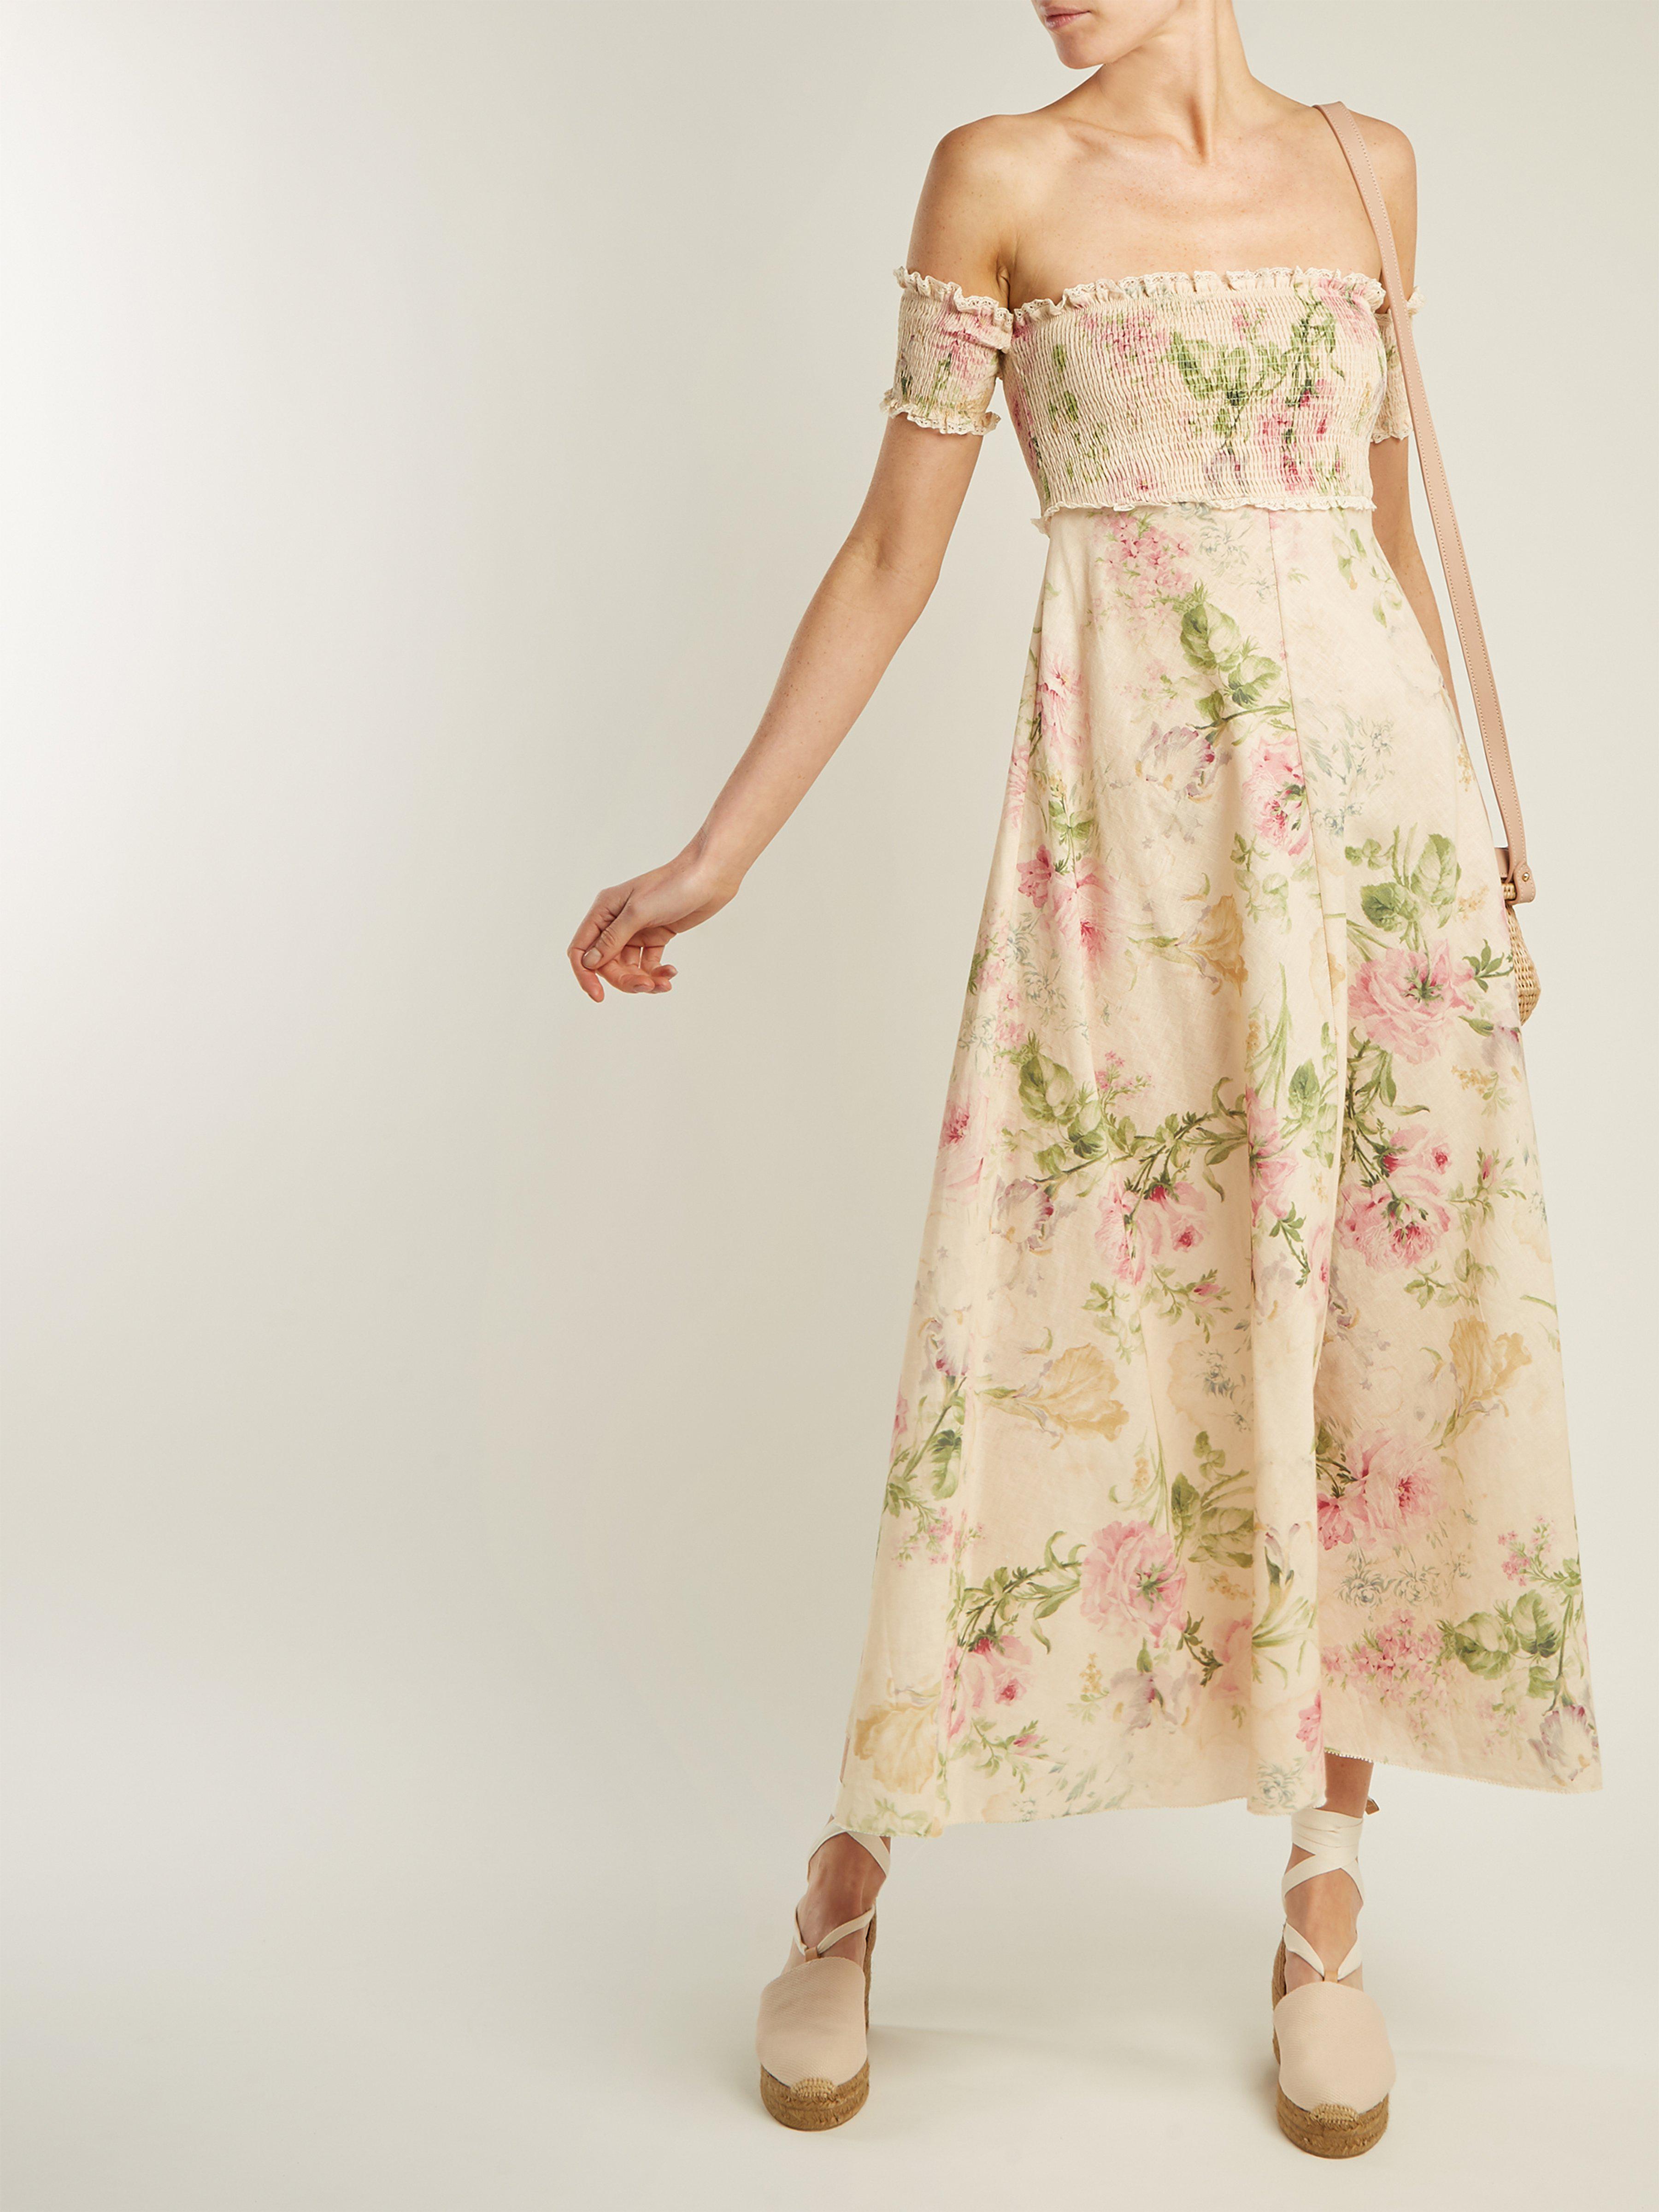 49f9e1994b Zimmermann Iris Shirred Linen And Cotton Blend Dress in Natural - Lyst